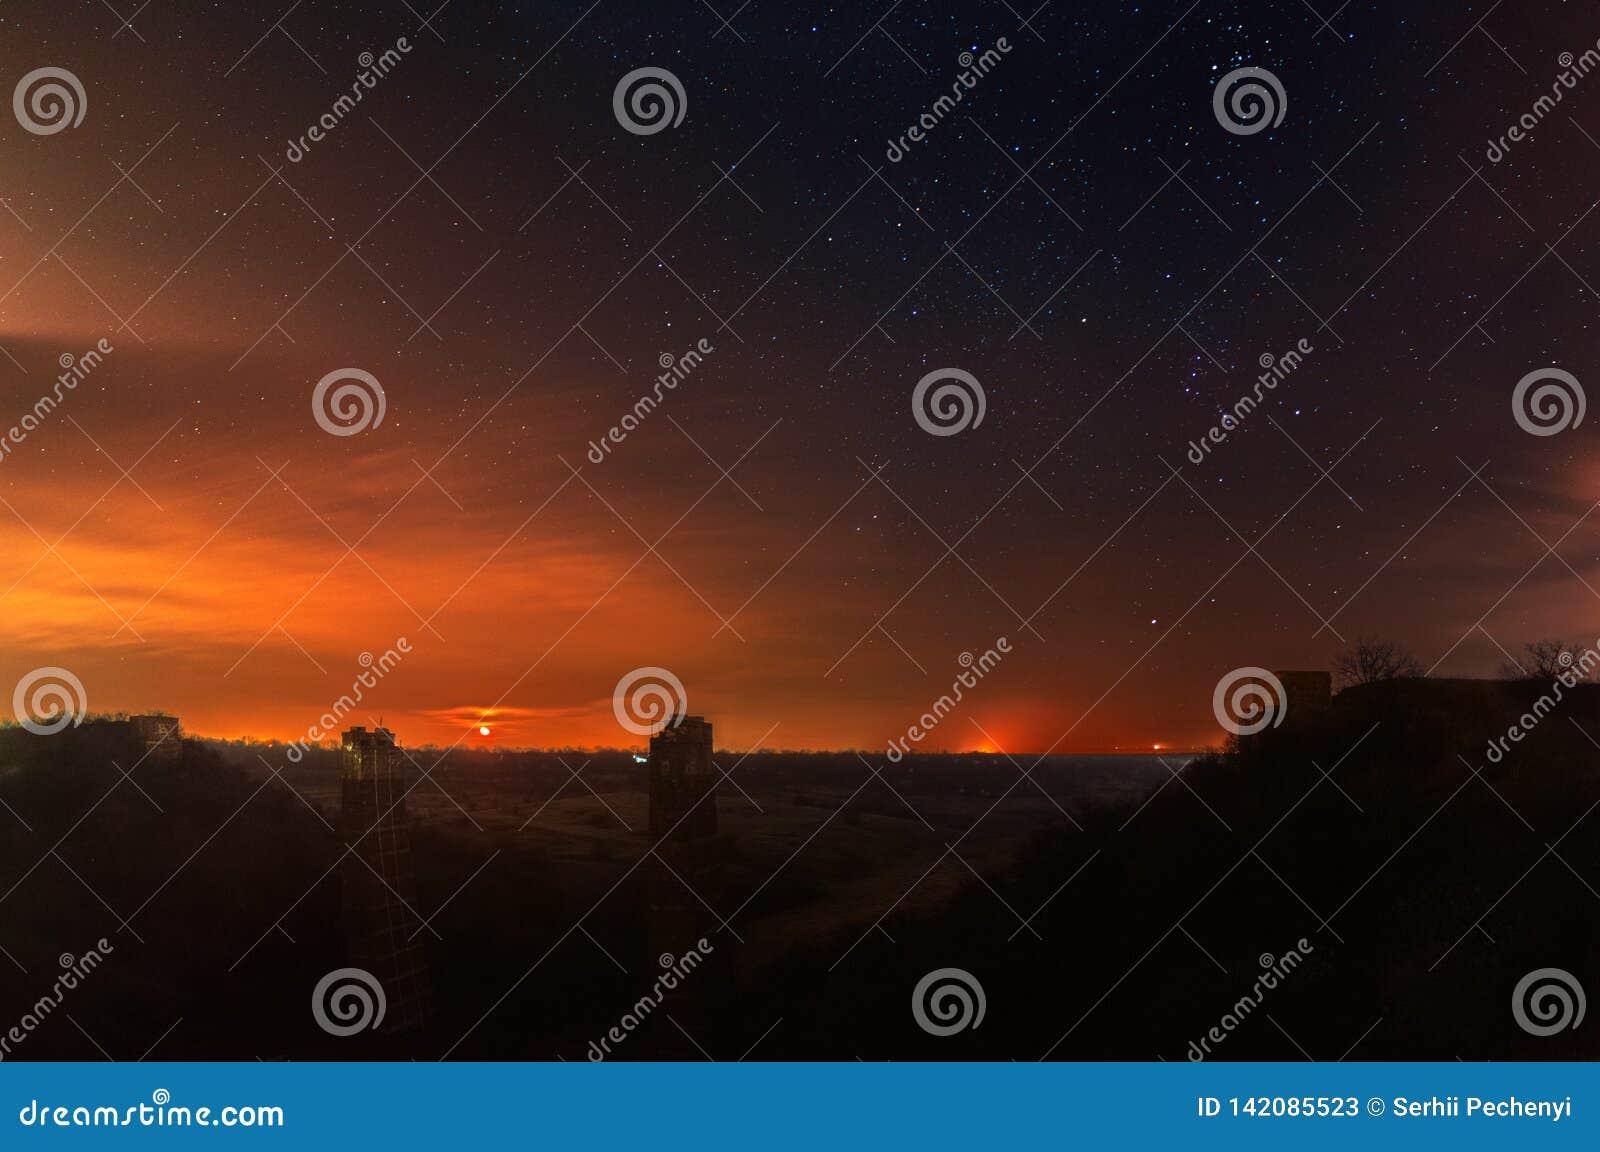 A moonrise photography. A fallen bridge ruins landscape. Starry Sky background